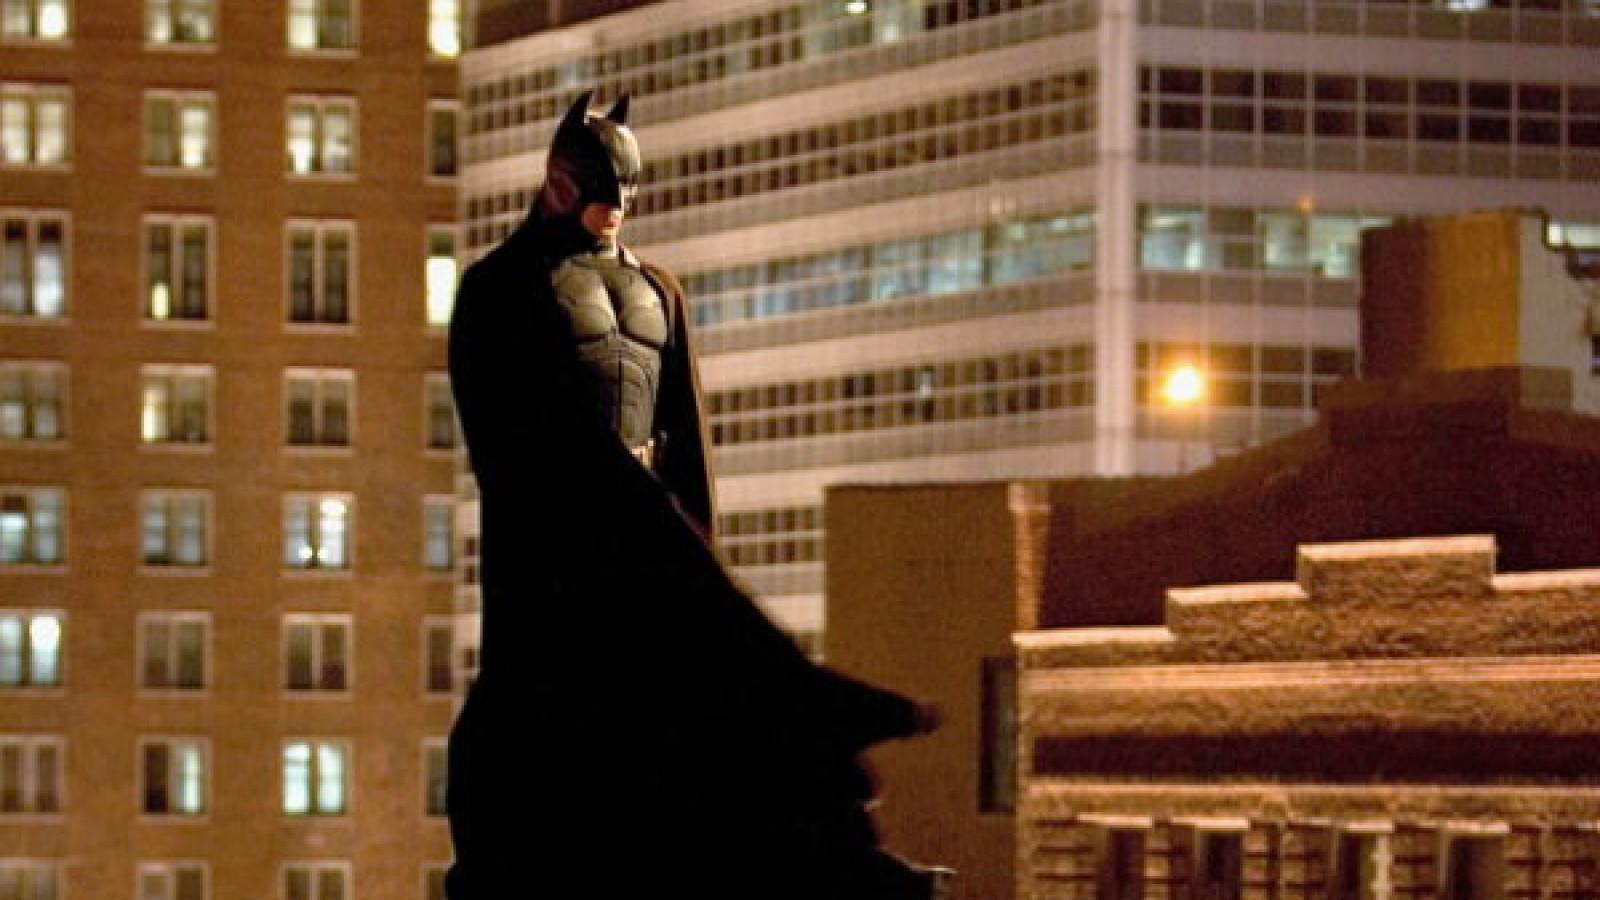 Title: BATMAN BEGINS ¥ Pers: BALE, CHRISTIAN ¥ Year: 2005 ¥ Dir: NOLAN, CHRISTOPHER ¥ Ref: BAT067AT ¥ Credit: [ THE KOBAL COLLECTION / WARNER BROS. / JAMES, DAVID ]